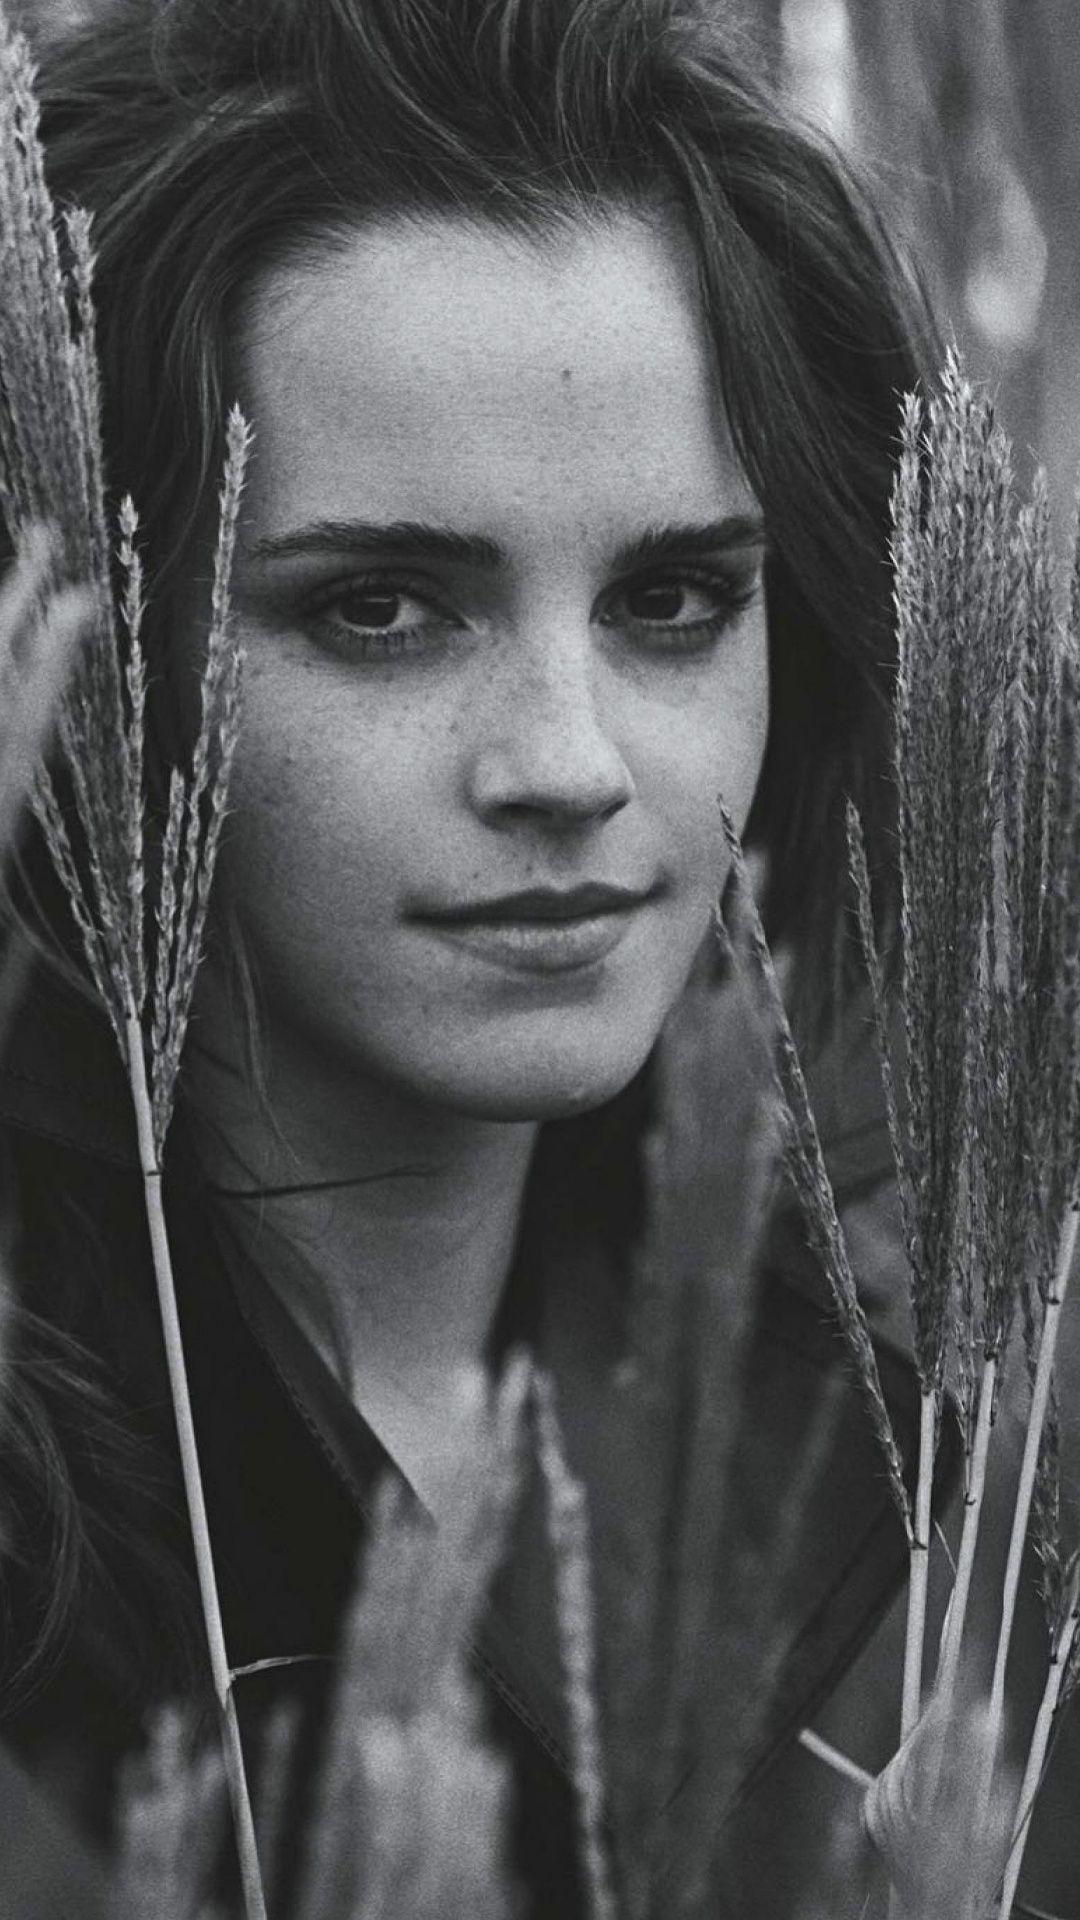 Emma Watson Outdoor Monochrome Vogue Australia 1080x1920 Wallpaper Celebrity Wallpapers Emma Watson Vogue Australia